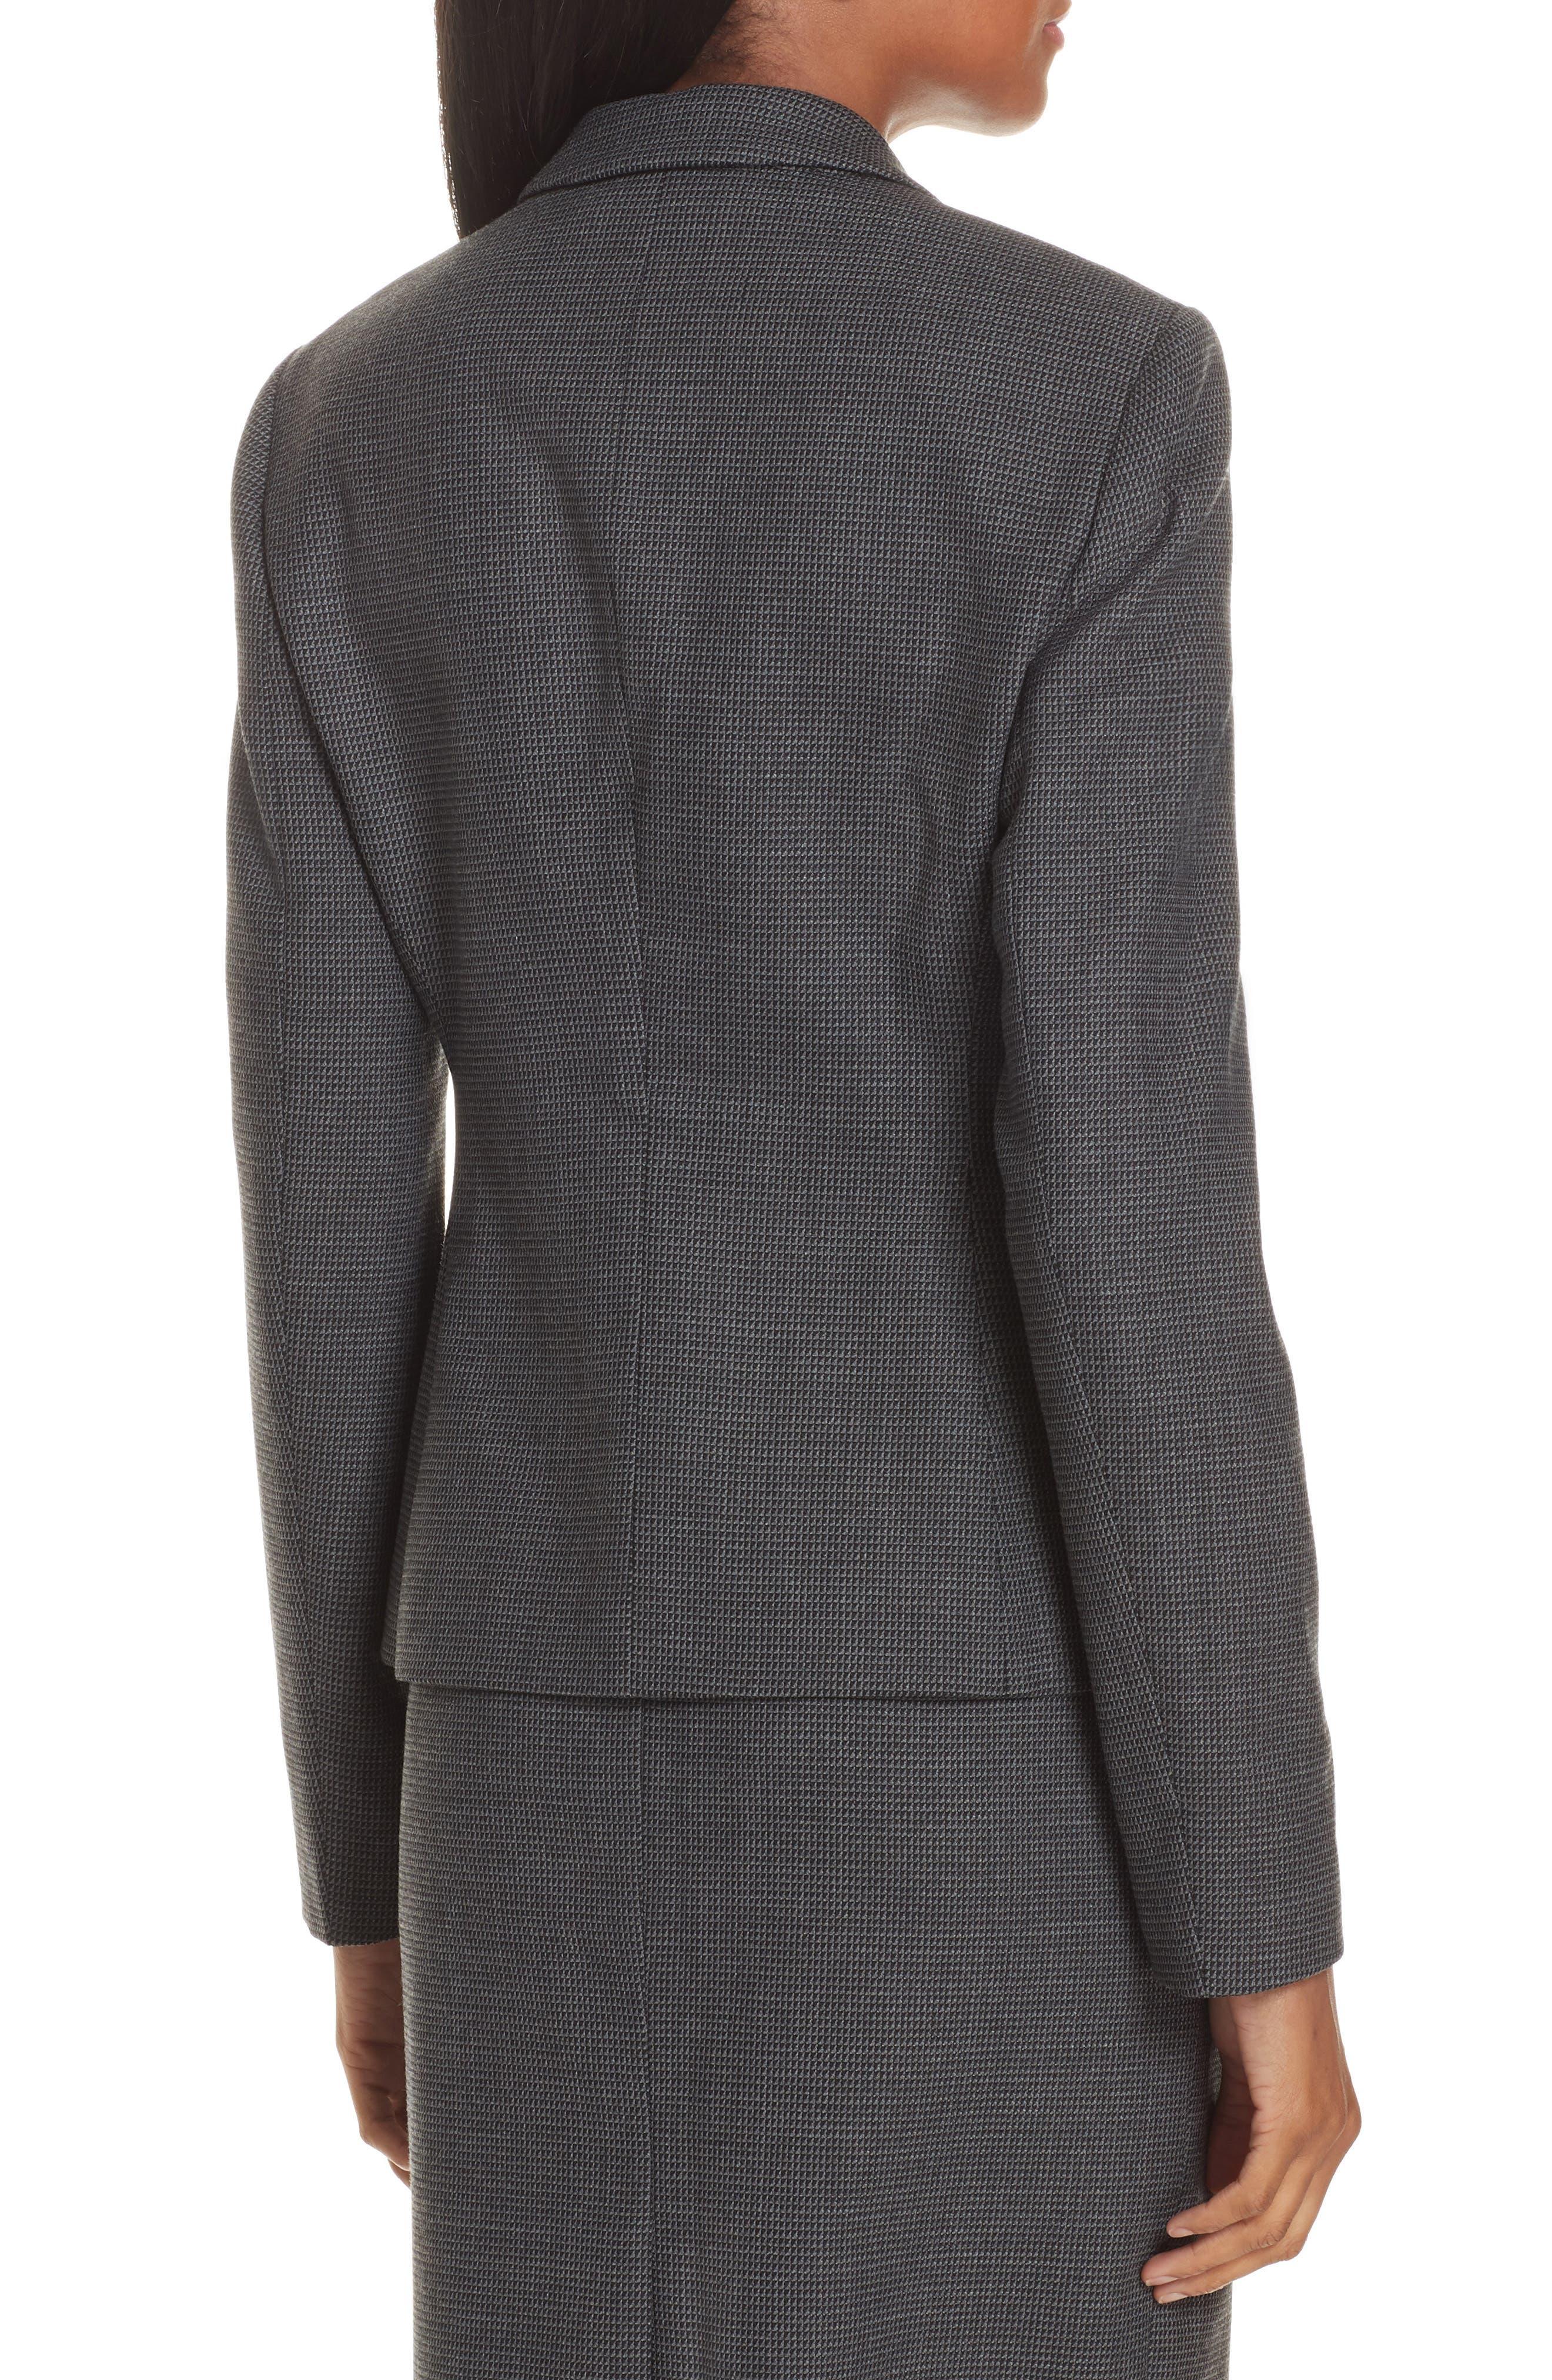 Jorita Geometric Wool Blend Suit Jacket,                             Alternate thumbnail 2, color,                             GREY FANTASY